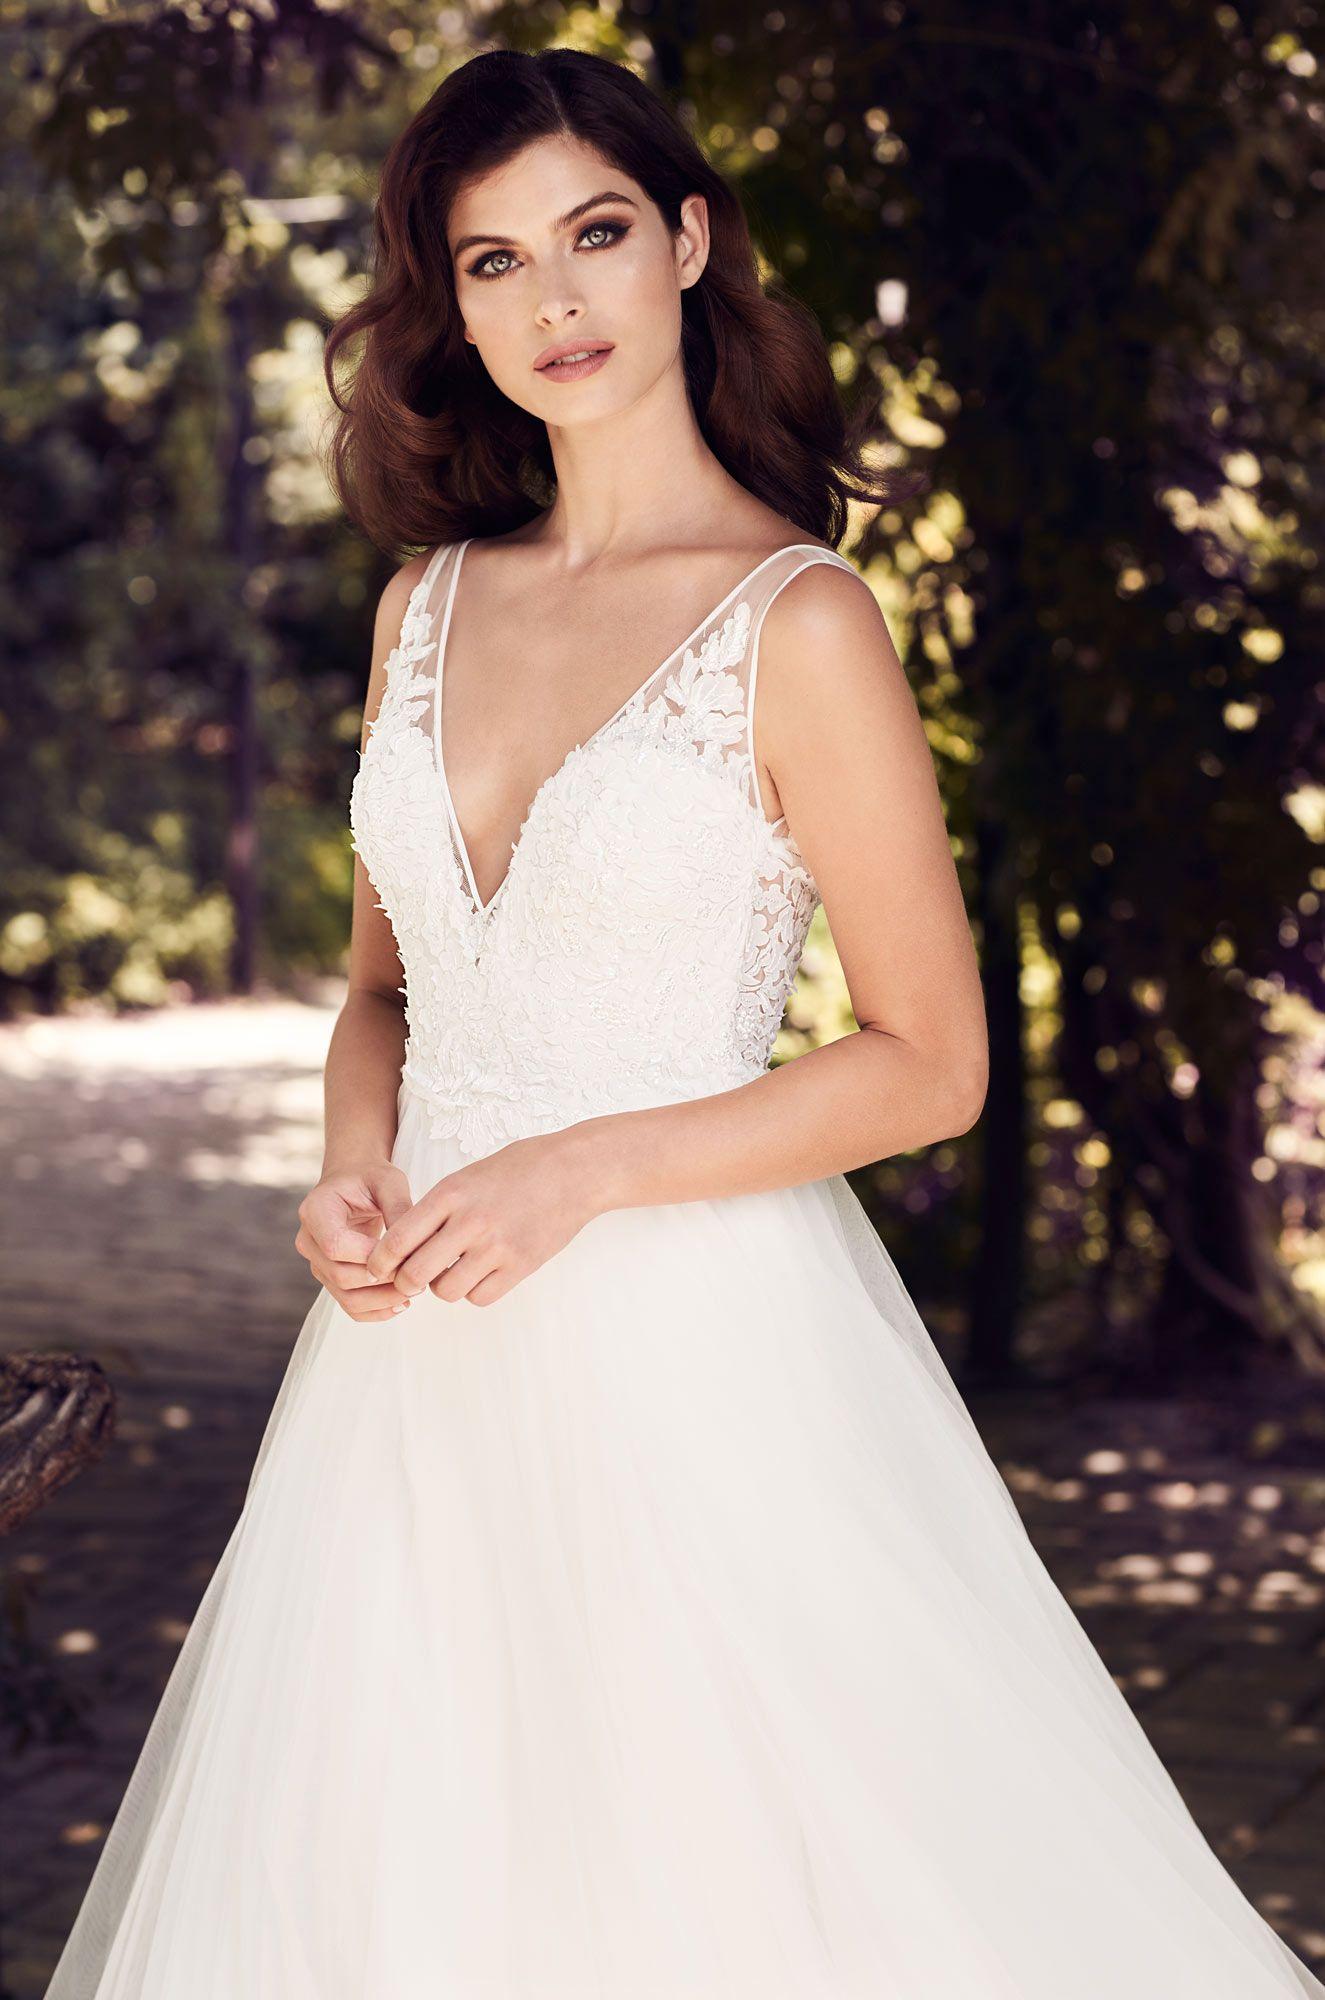 Aline tulle wedding dress style in wedding